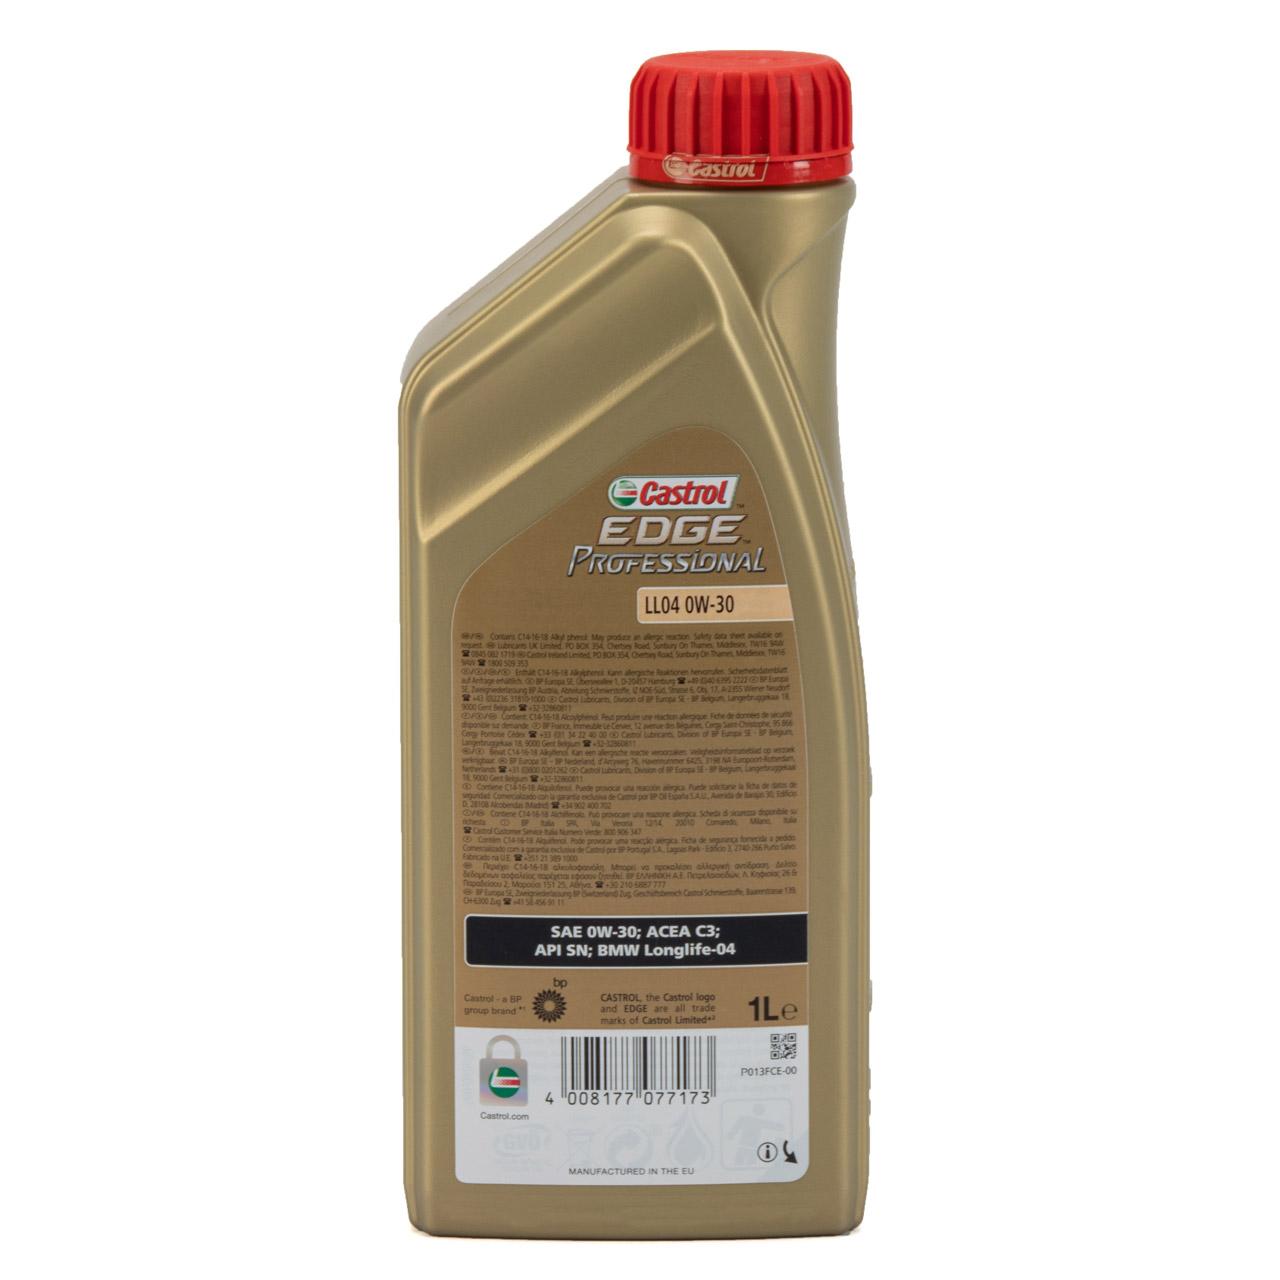 CASTROL EDGE Professional Motoröl Öl für BMW Longlife IV LL04 0W-30 - 1 Liter